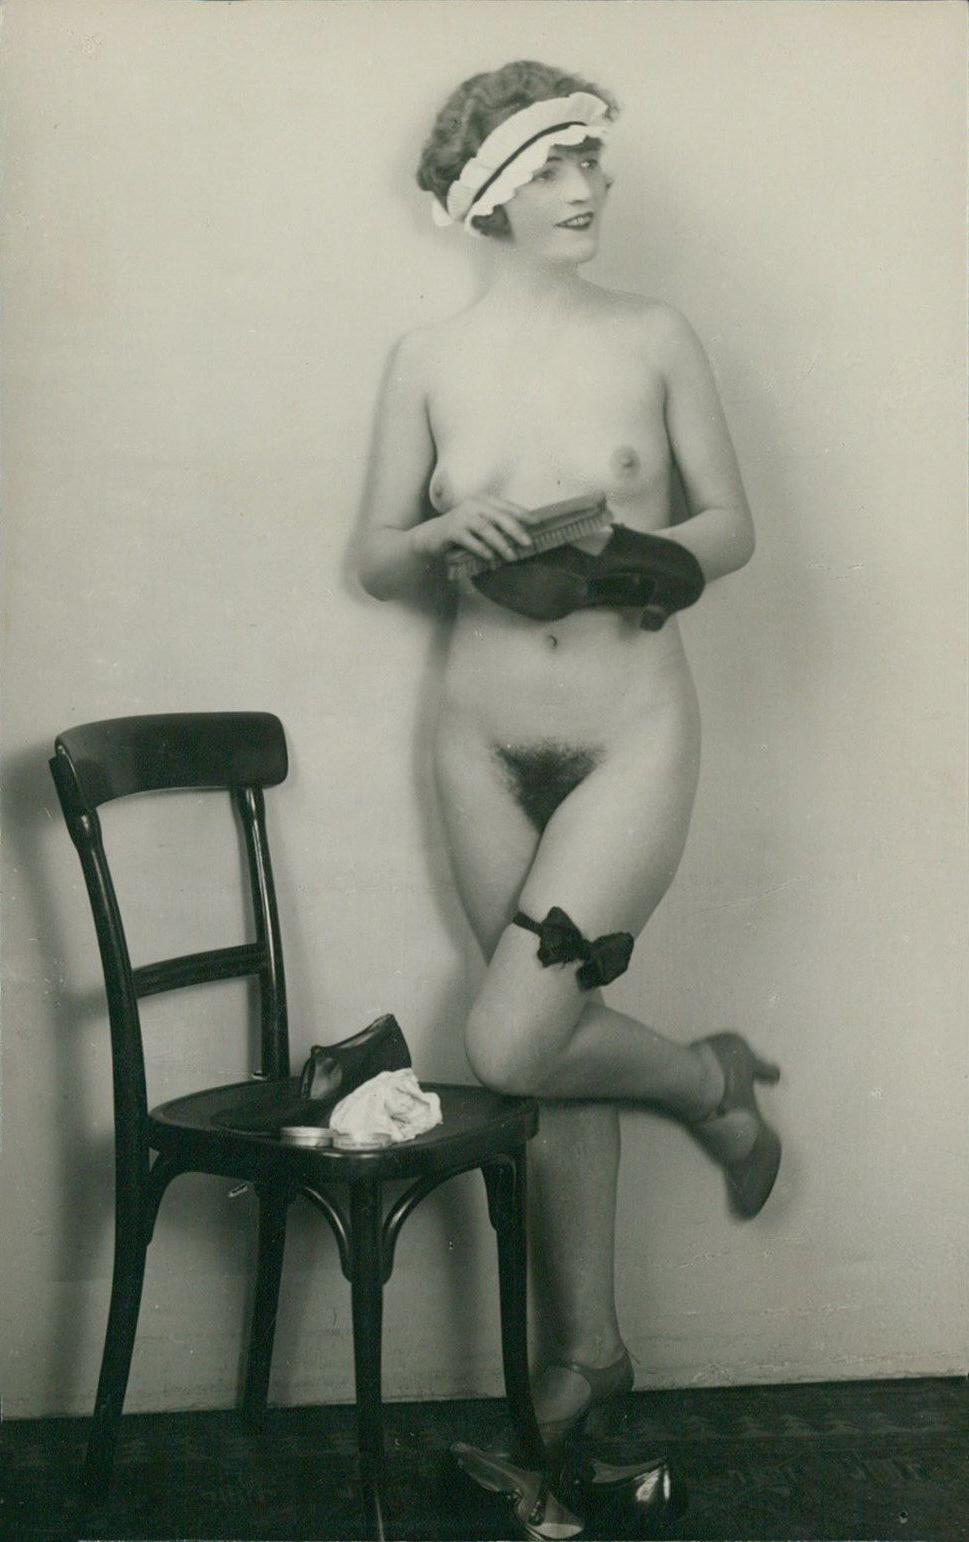 https://summertime75.files.wordpress.com/2014/07/german-austrian-full-nude-garters-maid-original-old-1920s.jpg